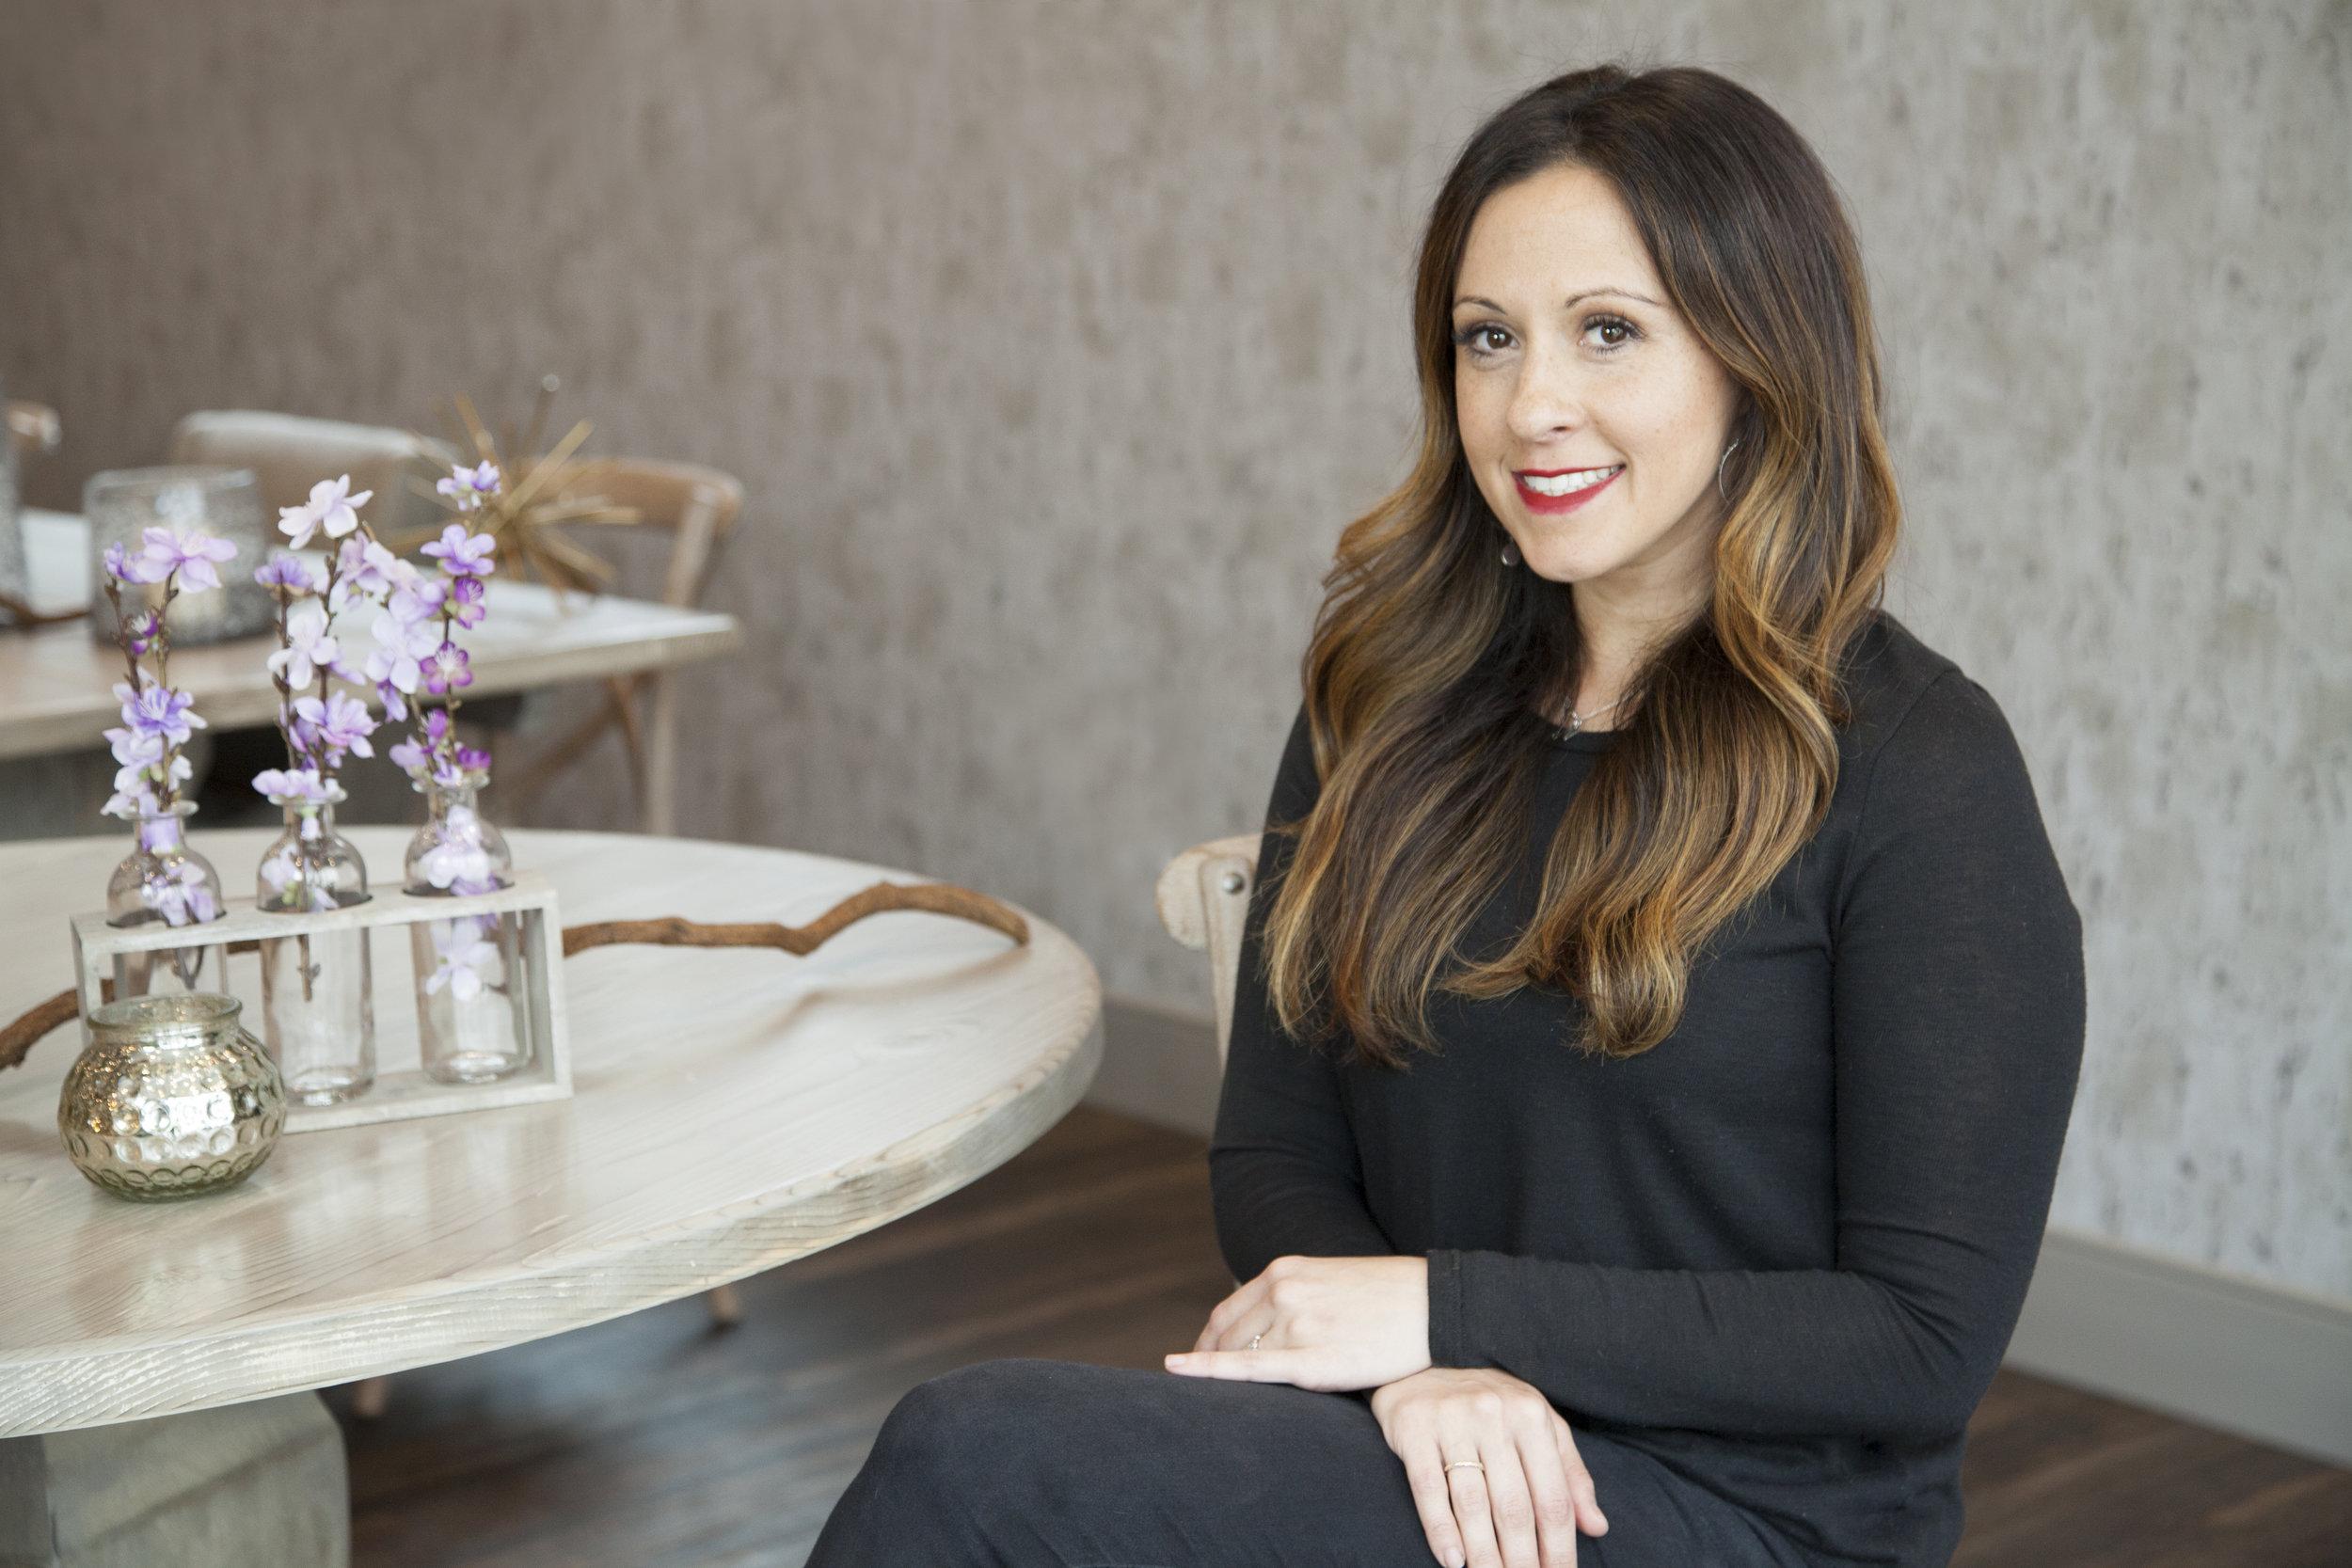 Naomi Rioux, Senior Hairstylist